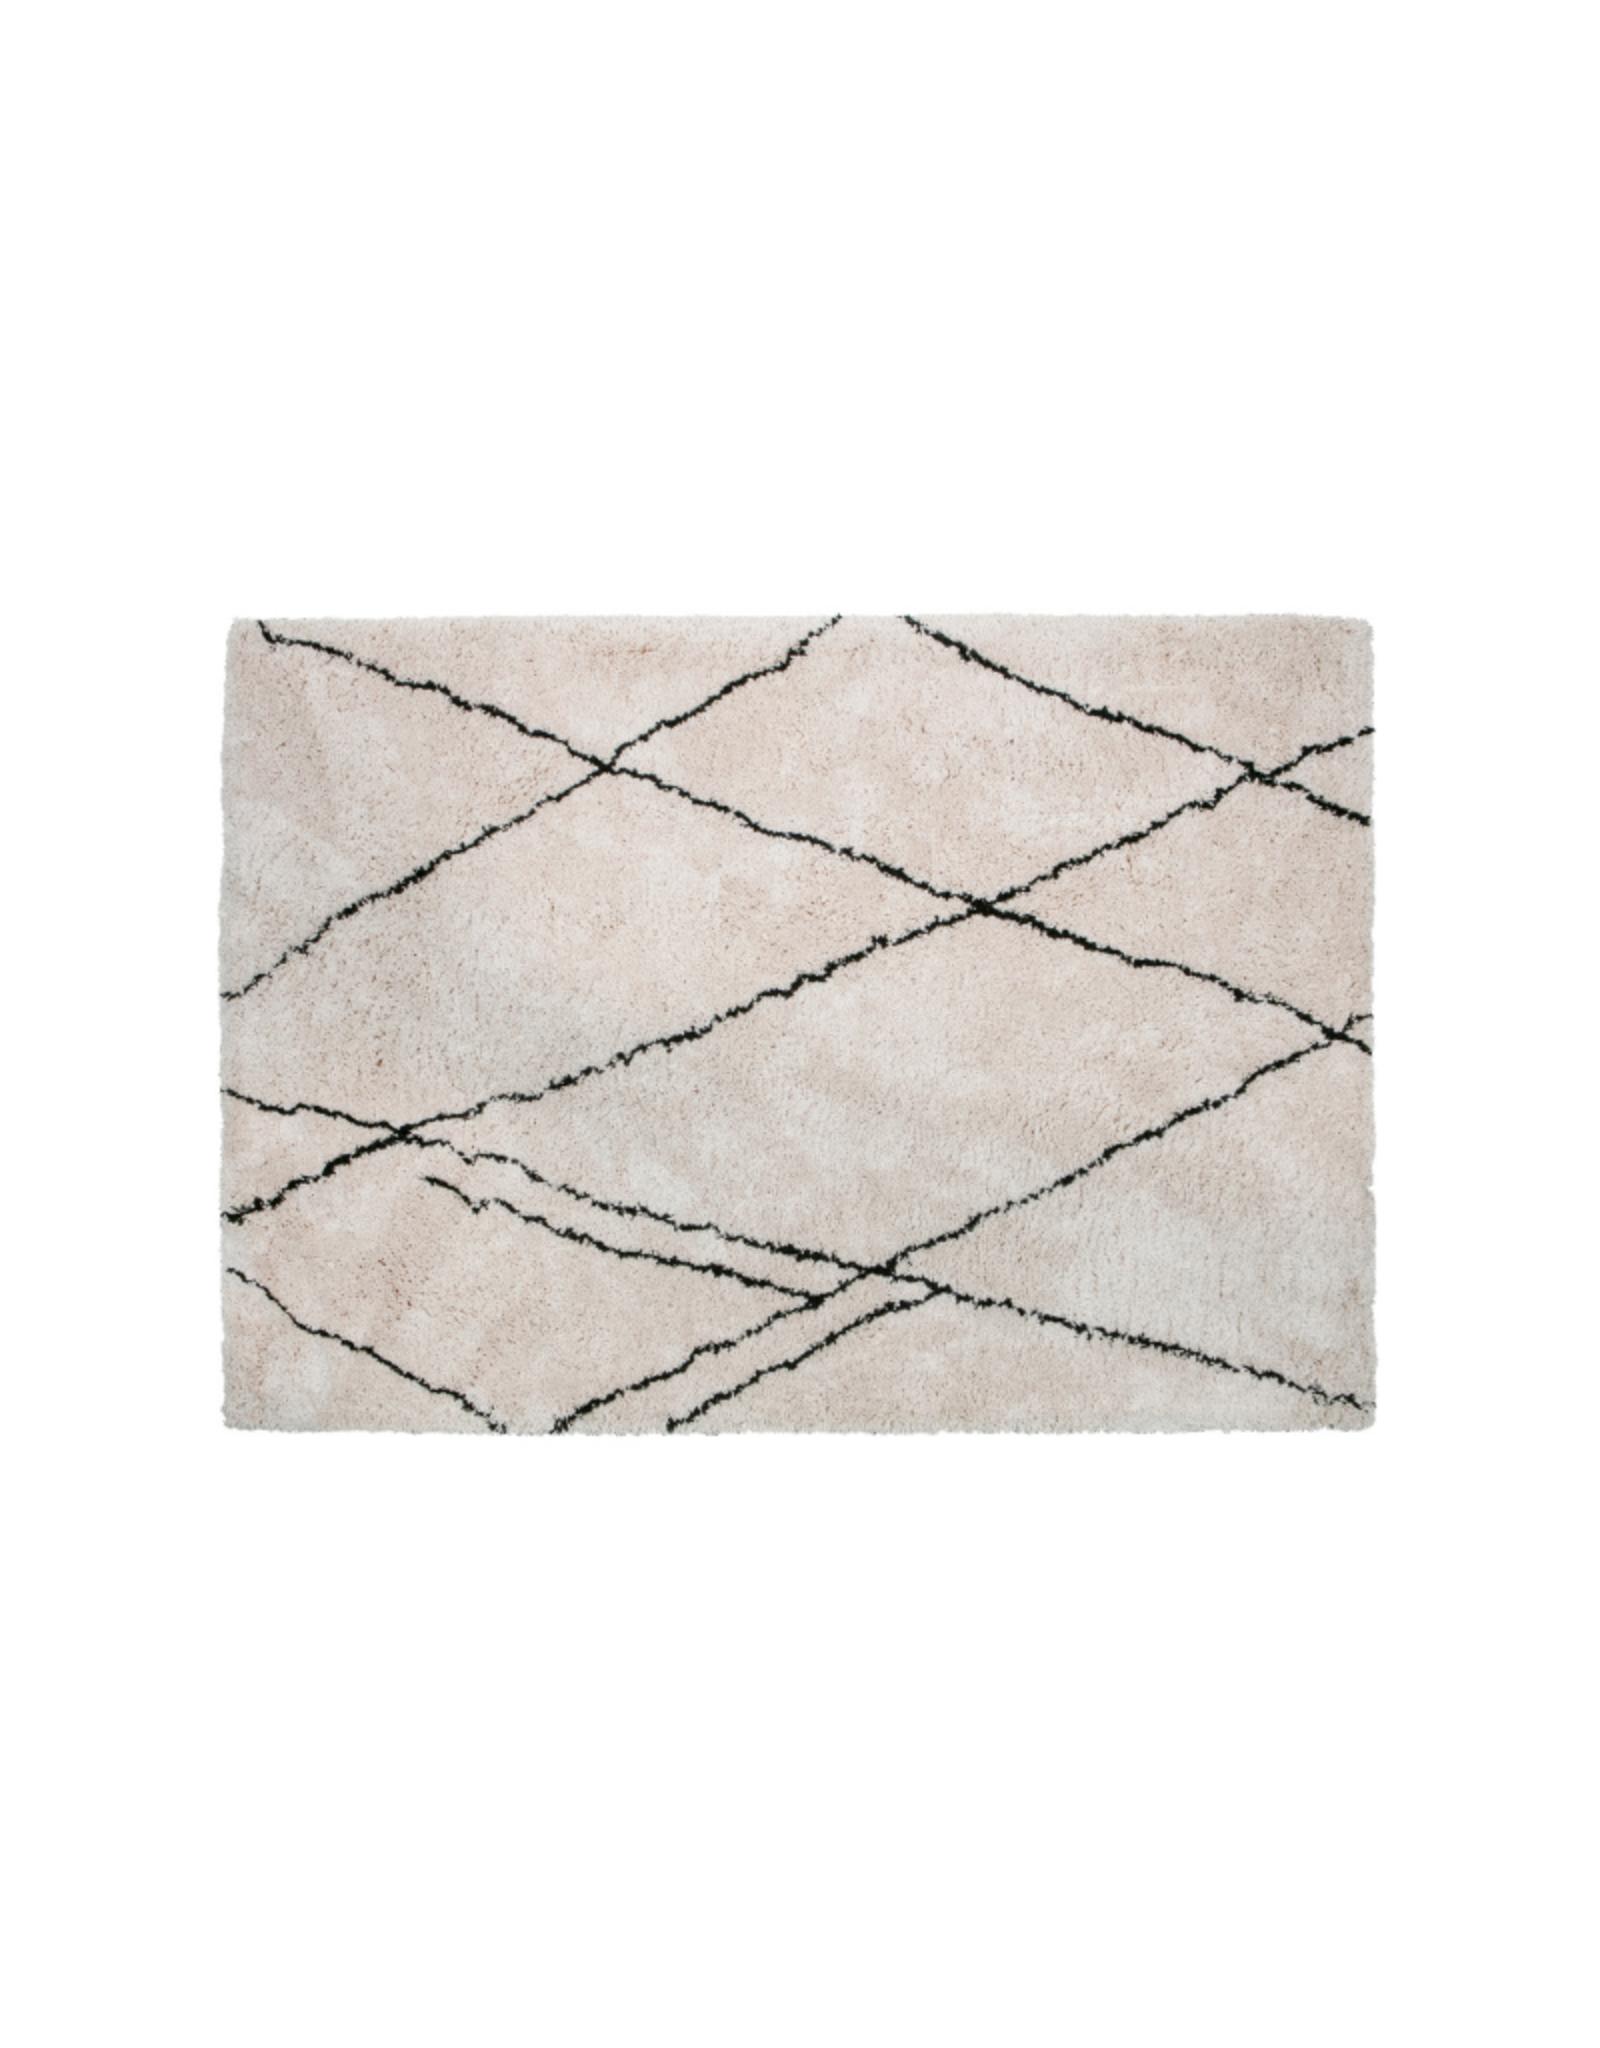 Vloerkleed Diamond 200 x 300 cm - Offwhite